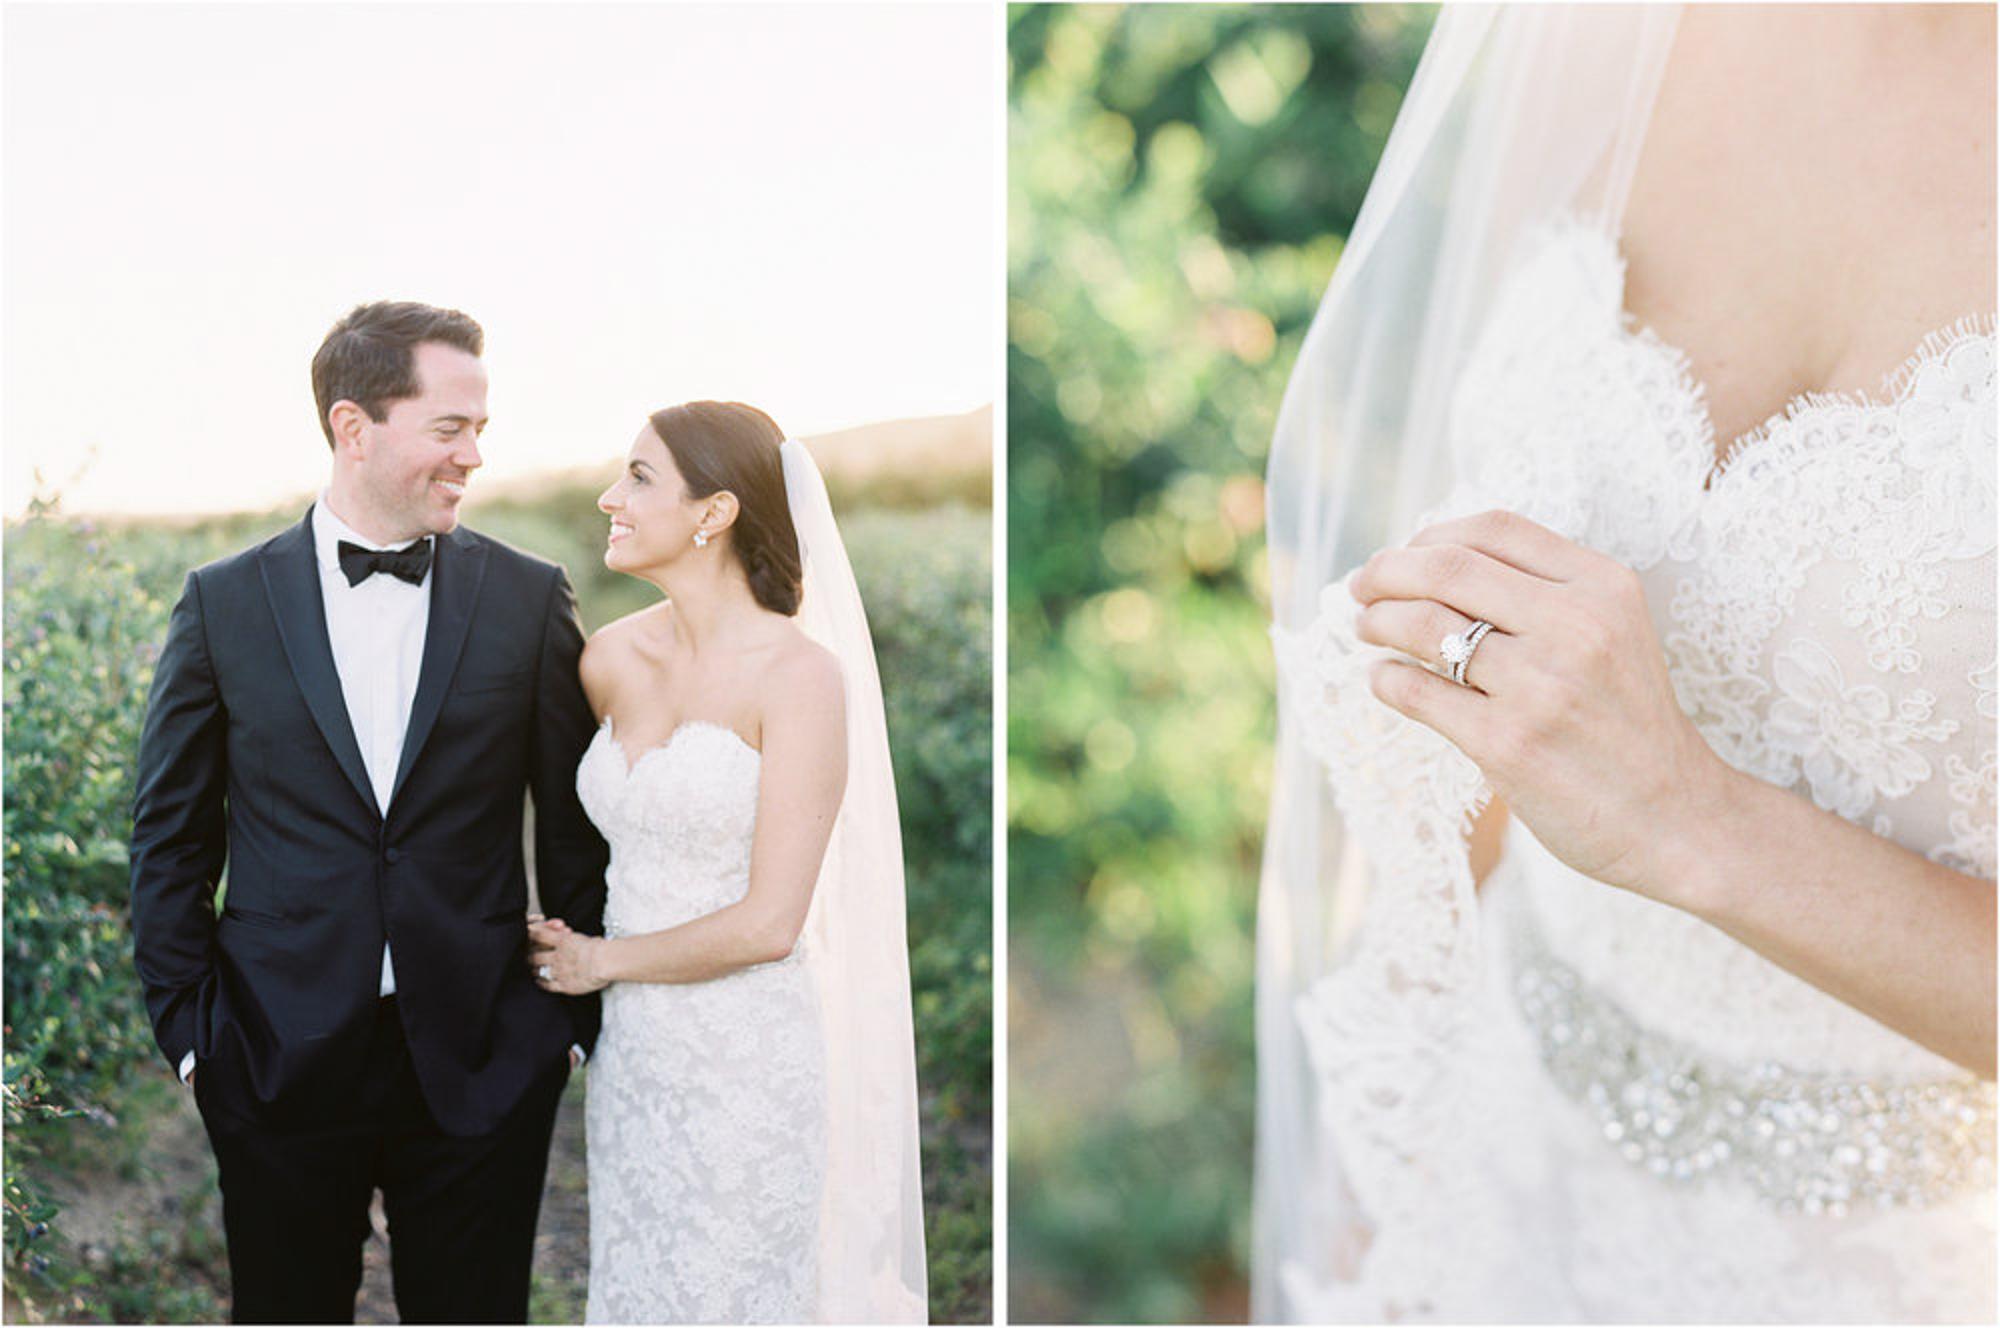 Gerry-Ranch-Wedding-Photography-Kristina-Adams-27.jpg